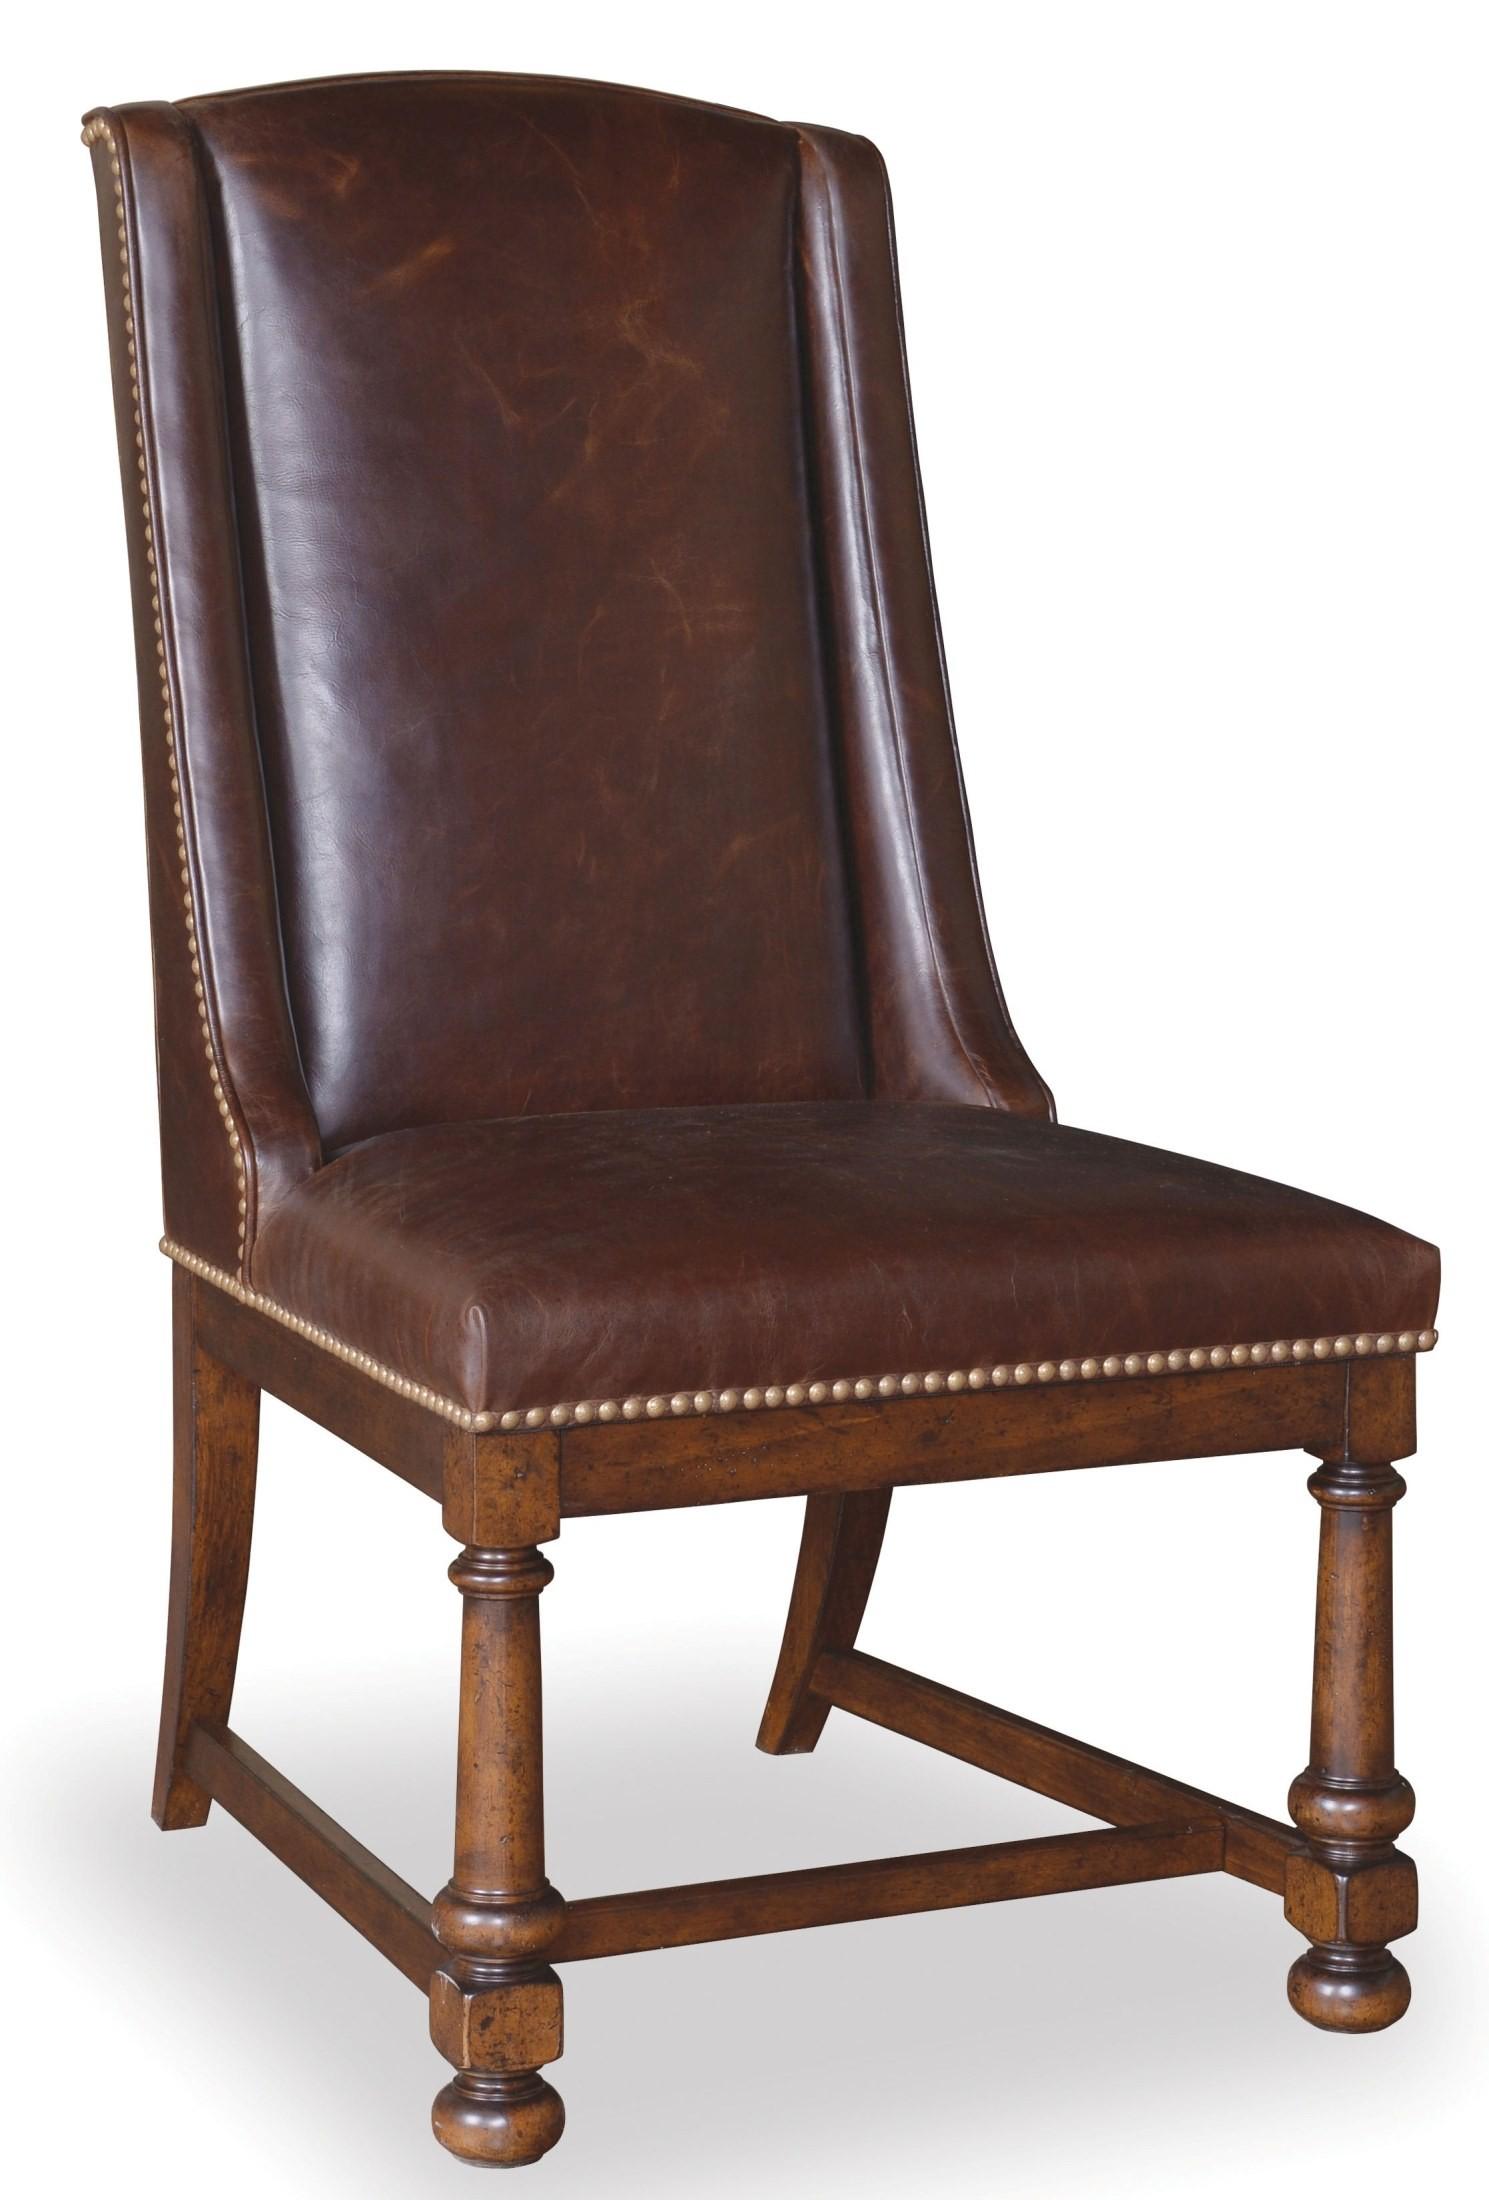 Whiskey Barrel Oak Leather Side Chair Set of 2 from ART